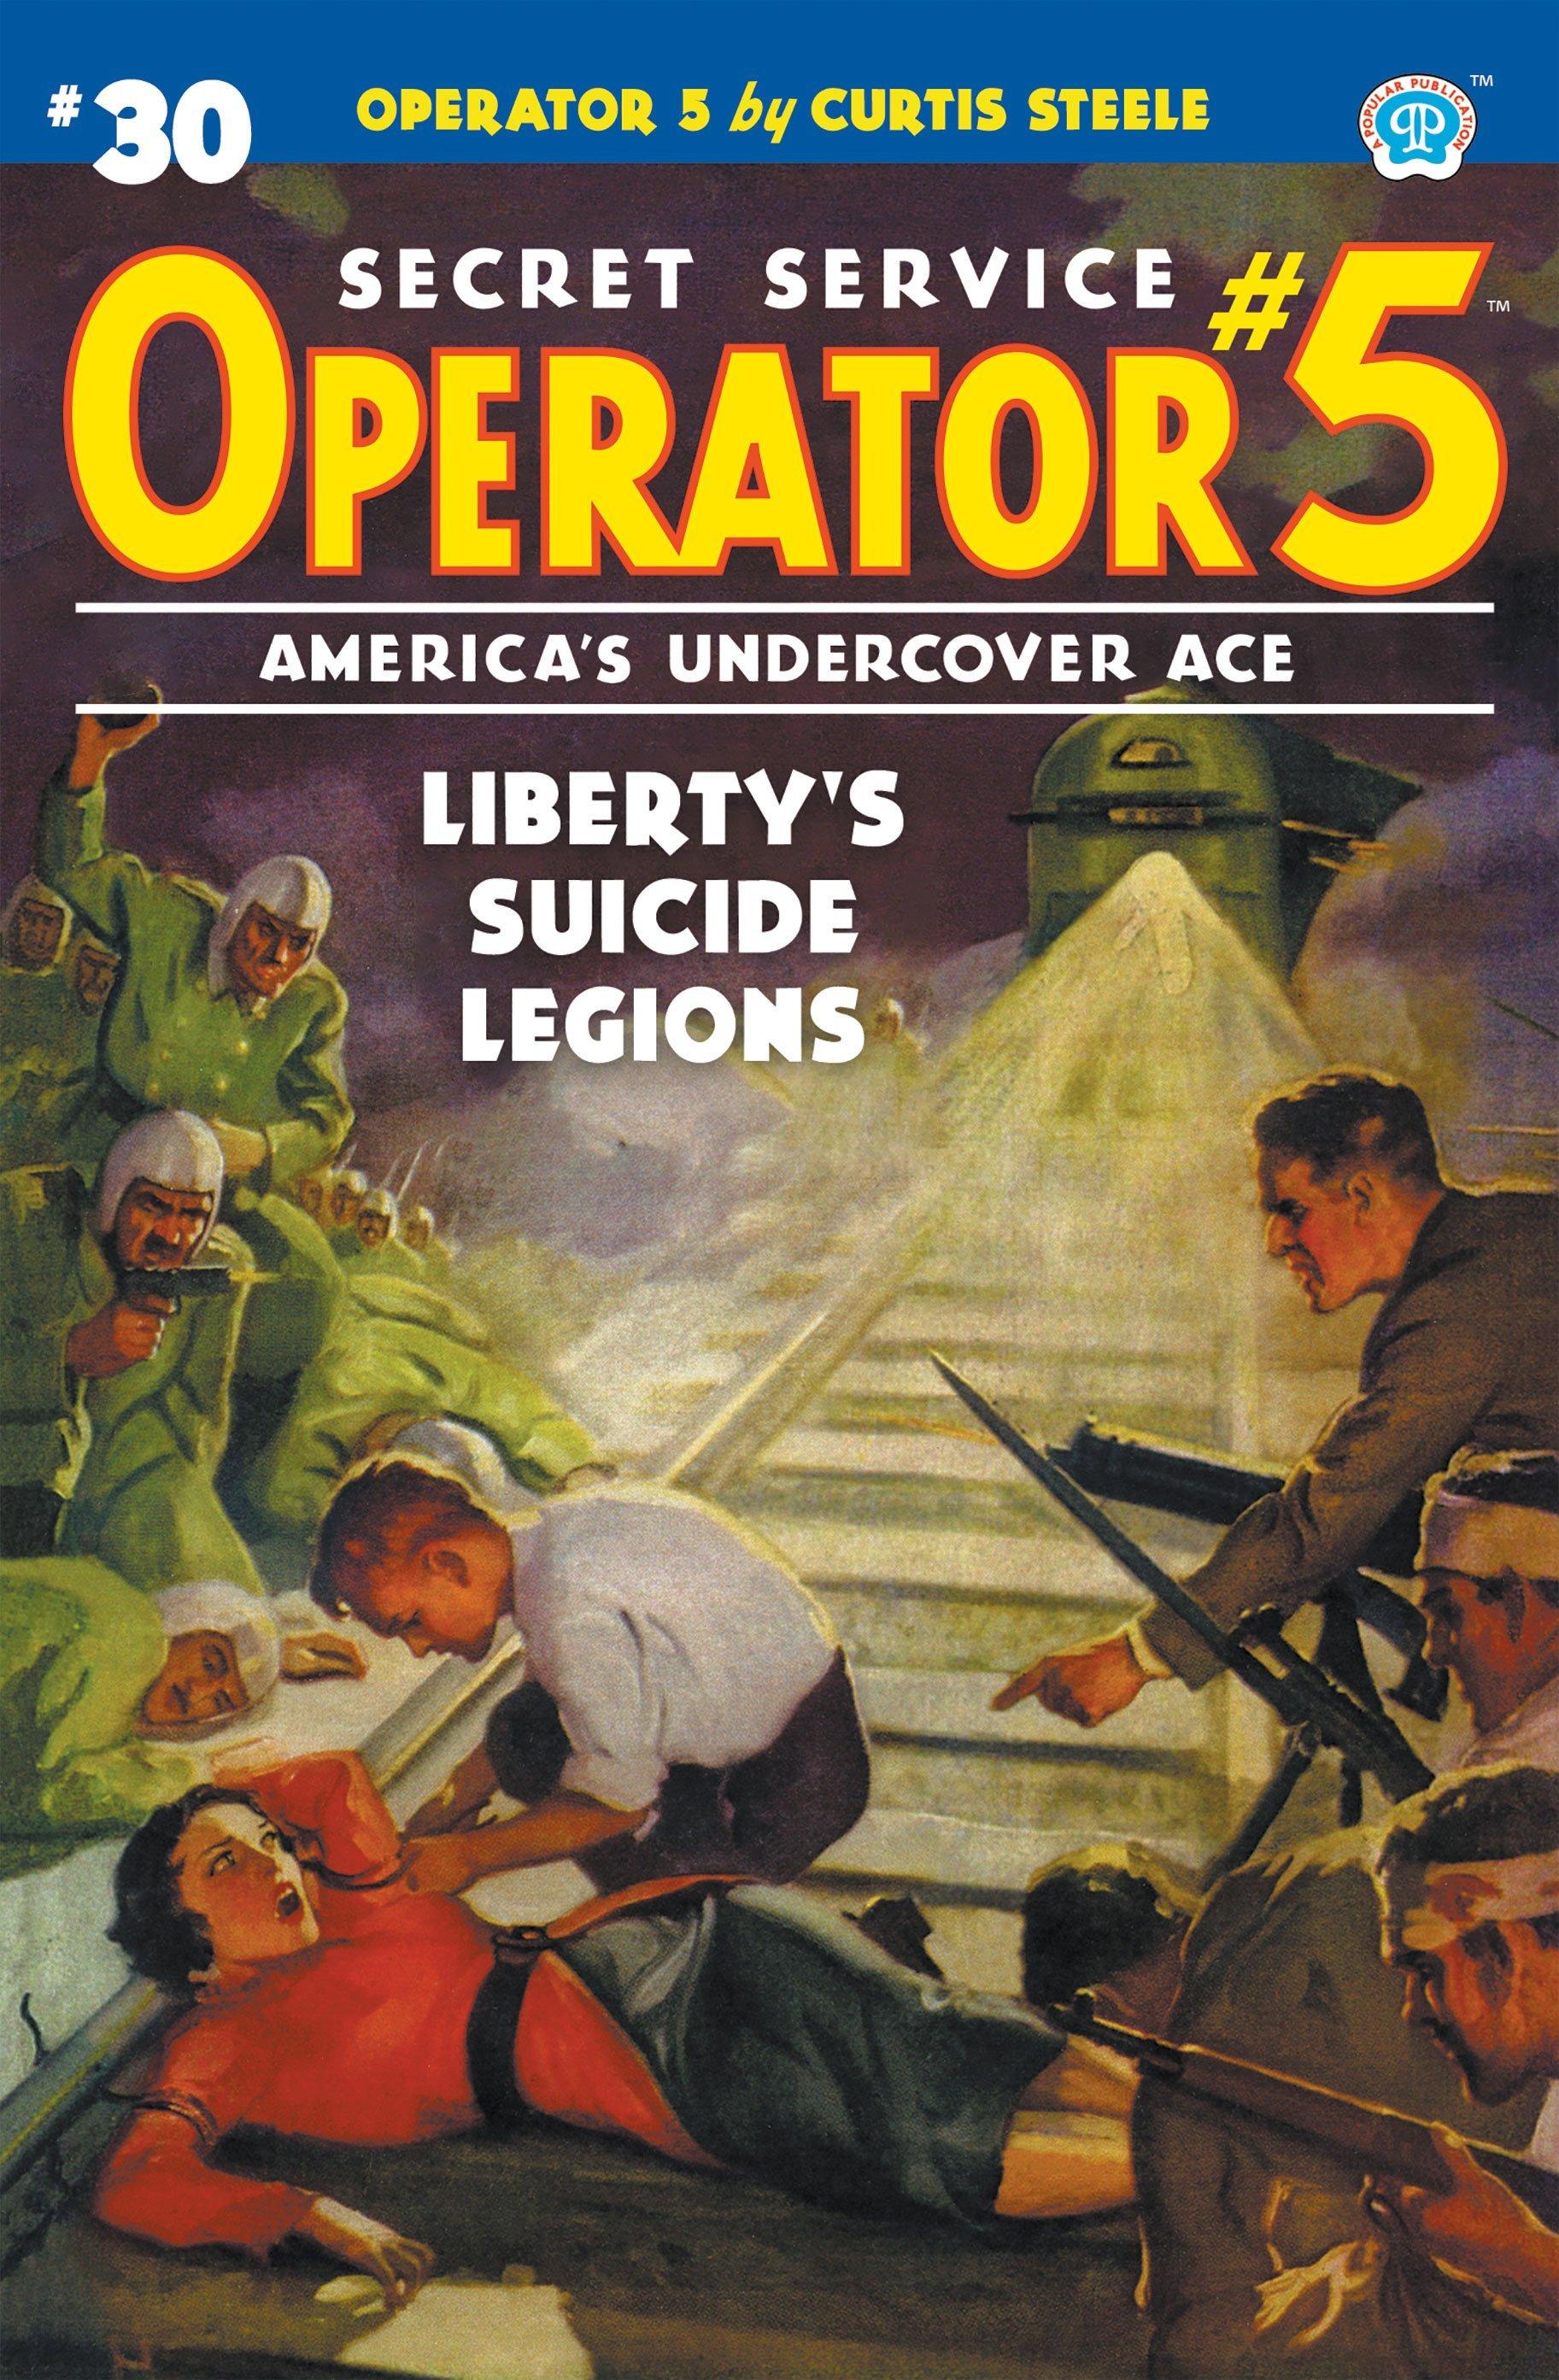 Operator 5 #30: Liberty's Suicide Legions